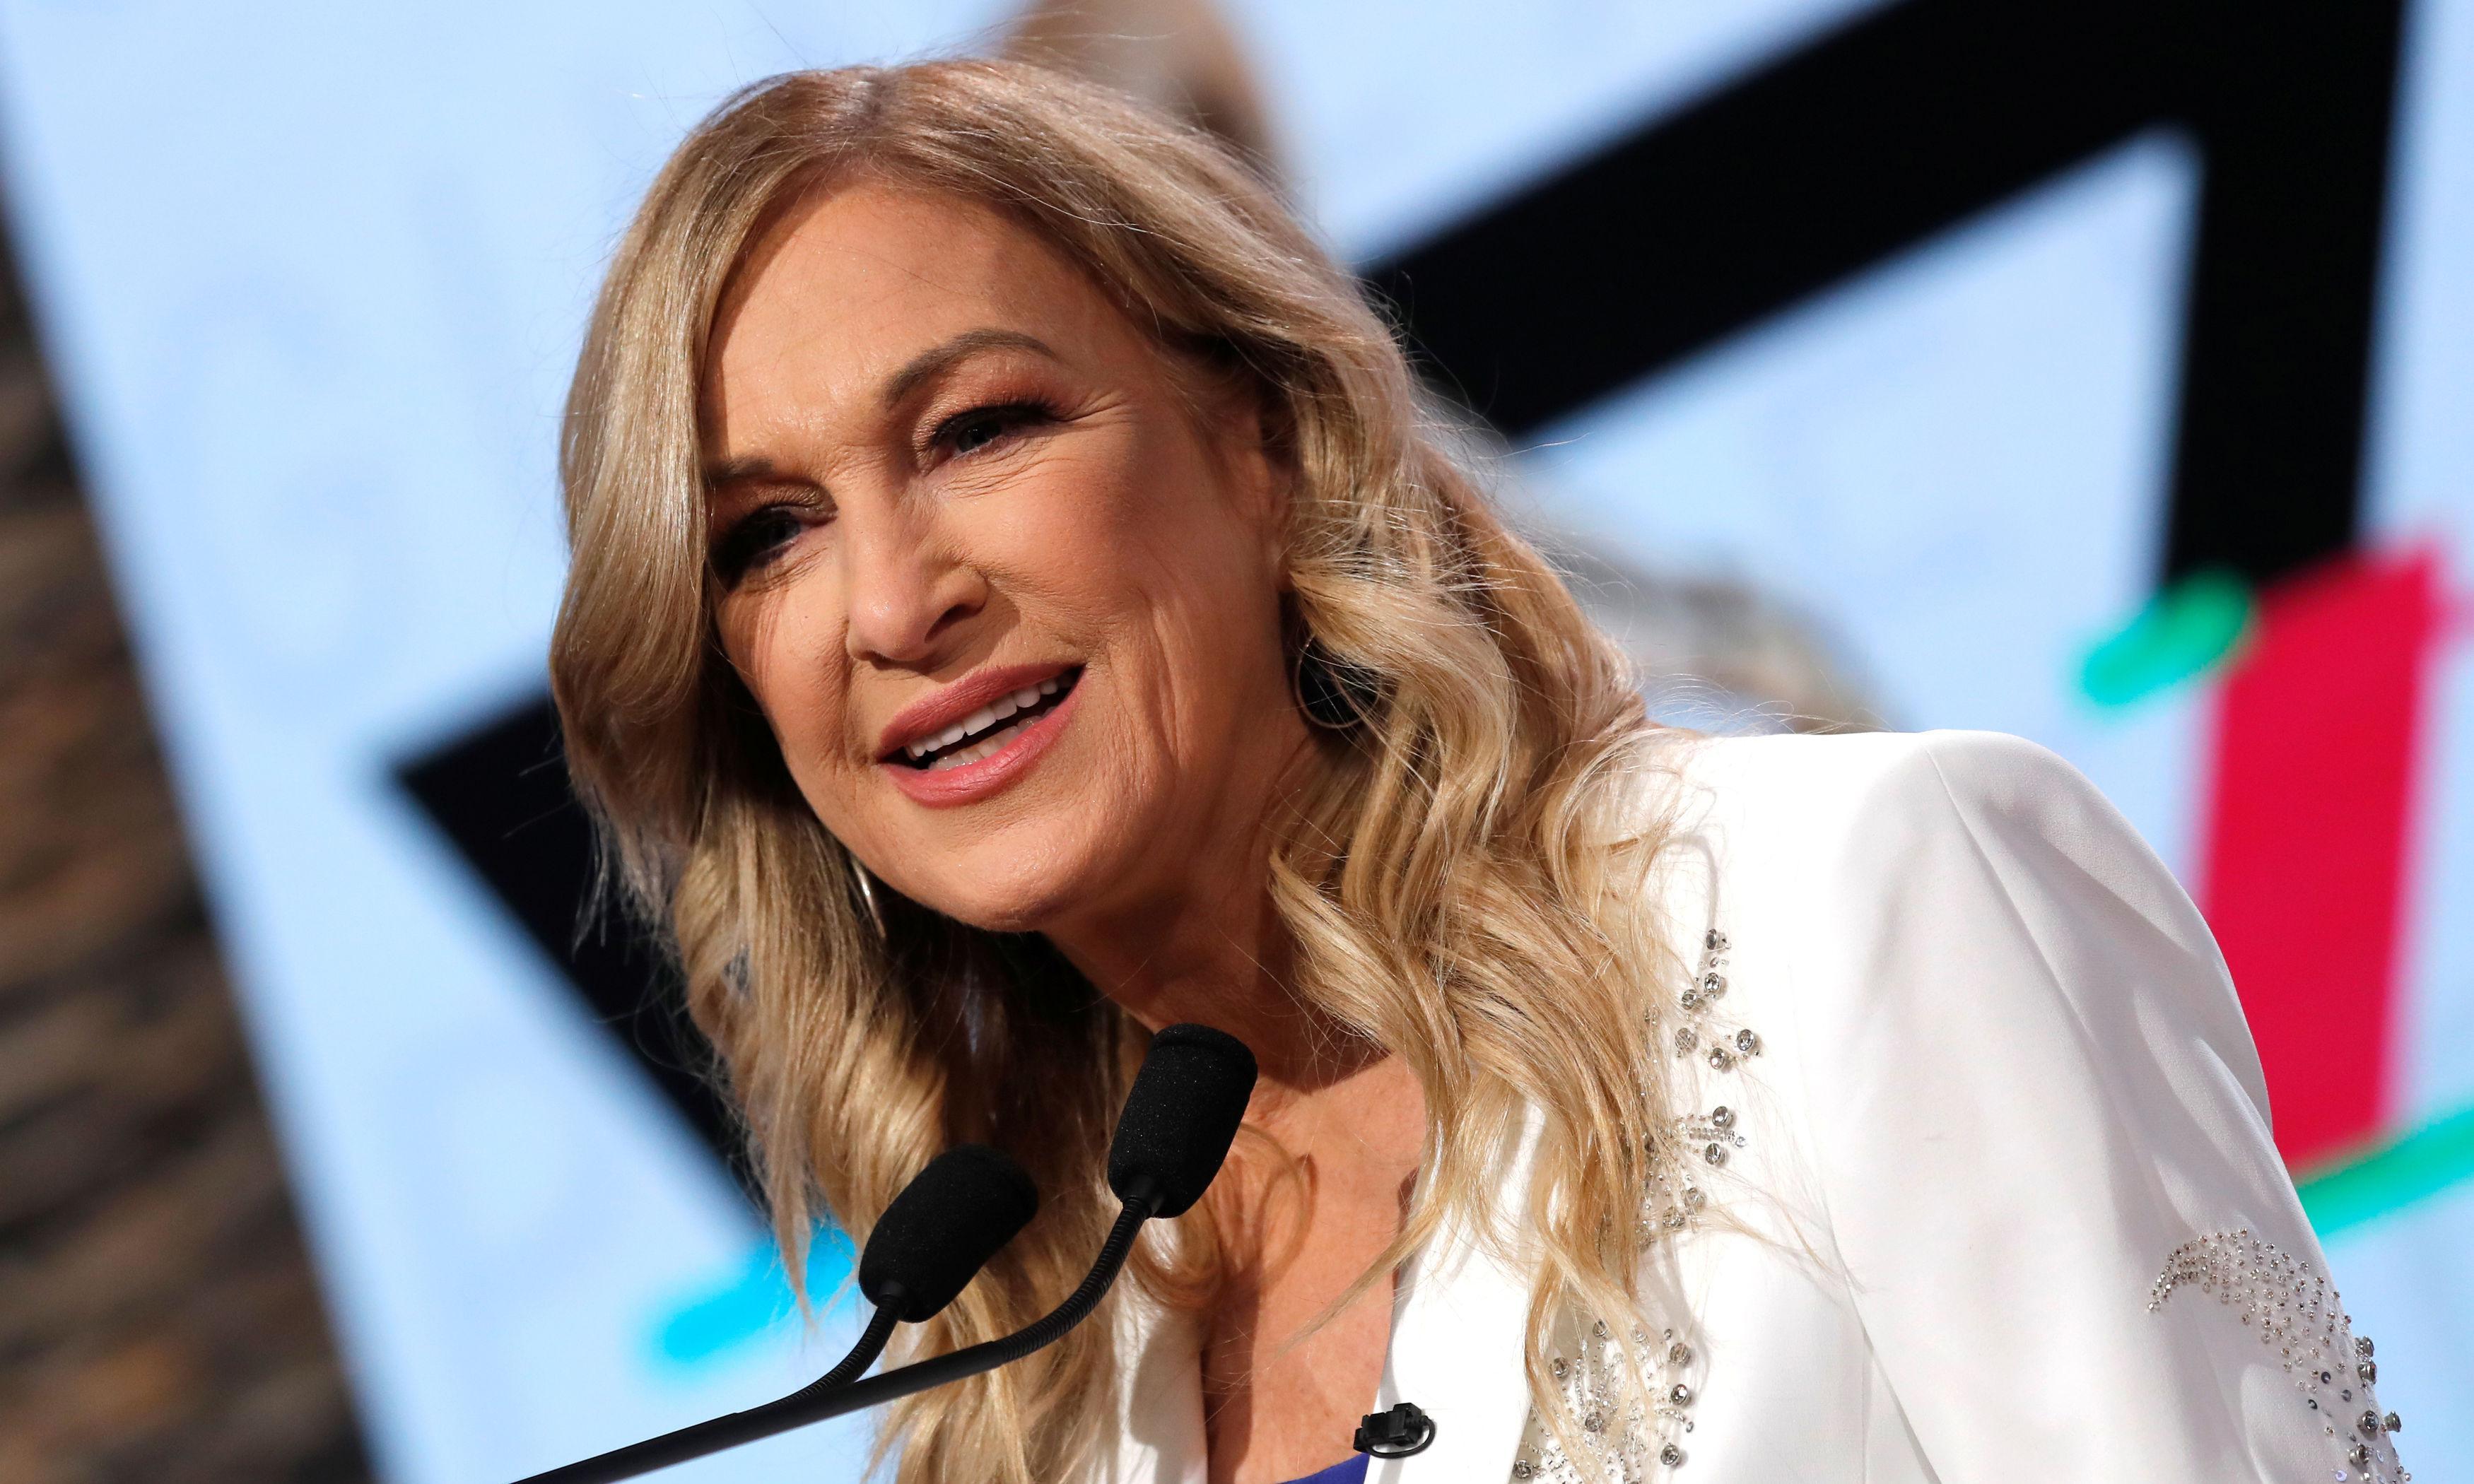 Grammys chief Deborah Dugan suspended after misconduct allegation